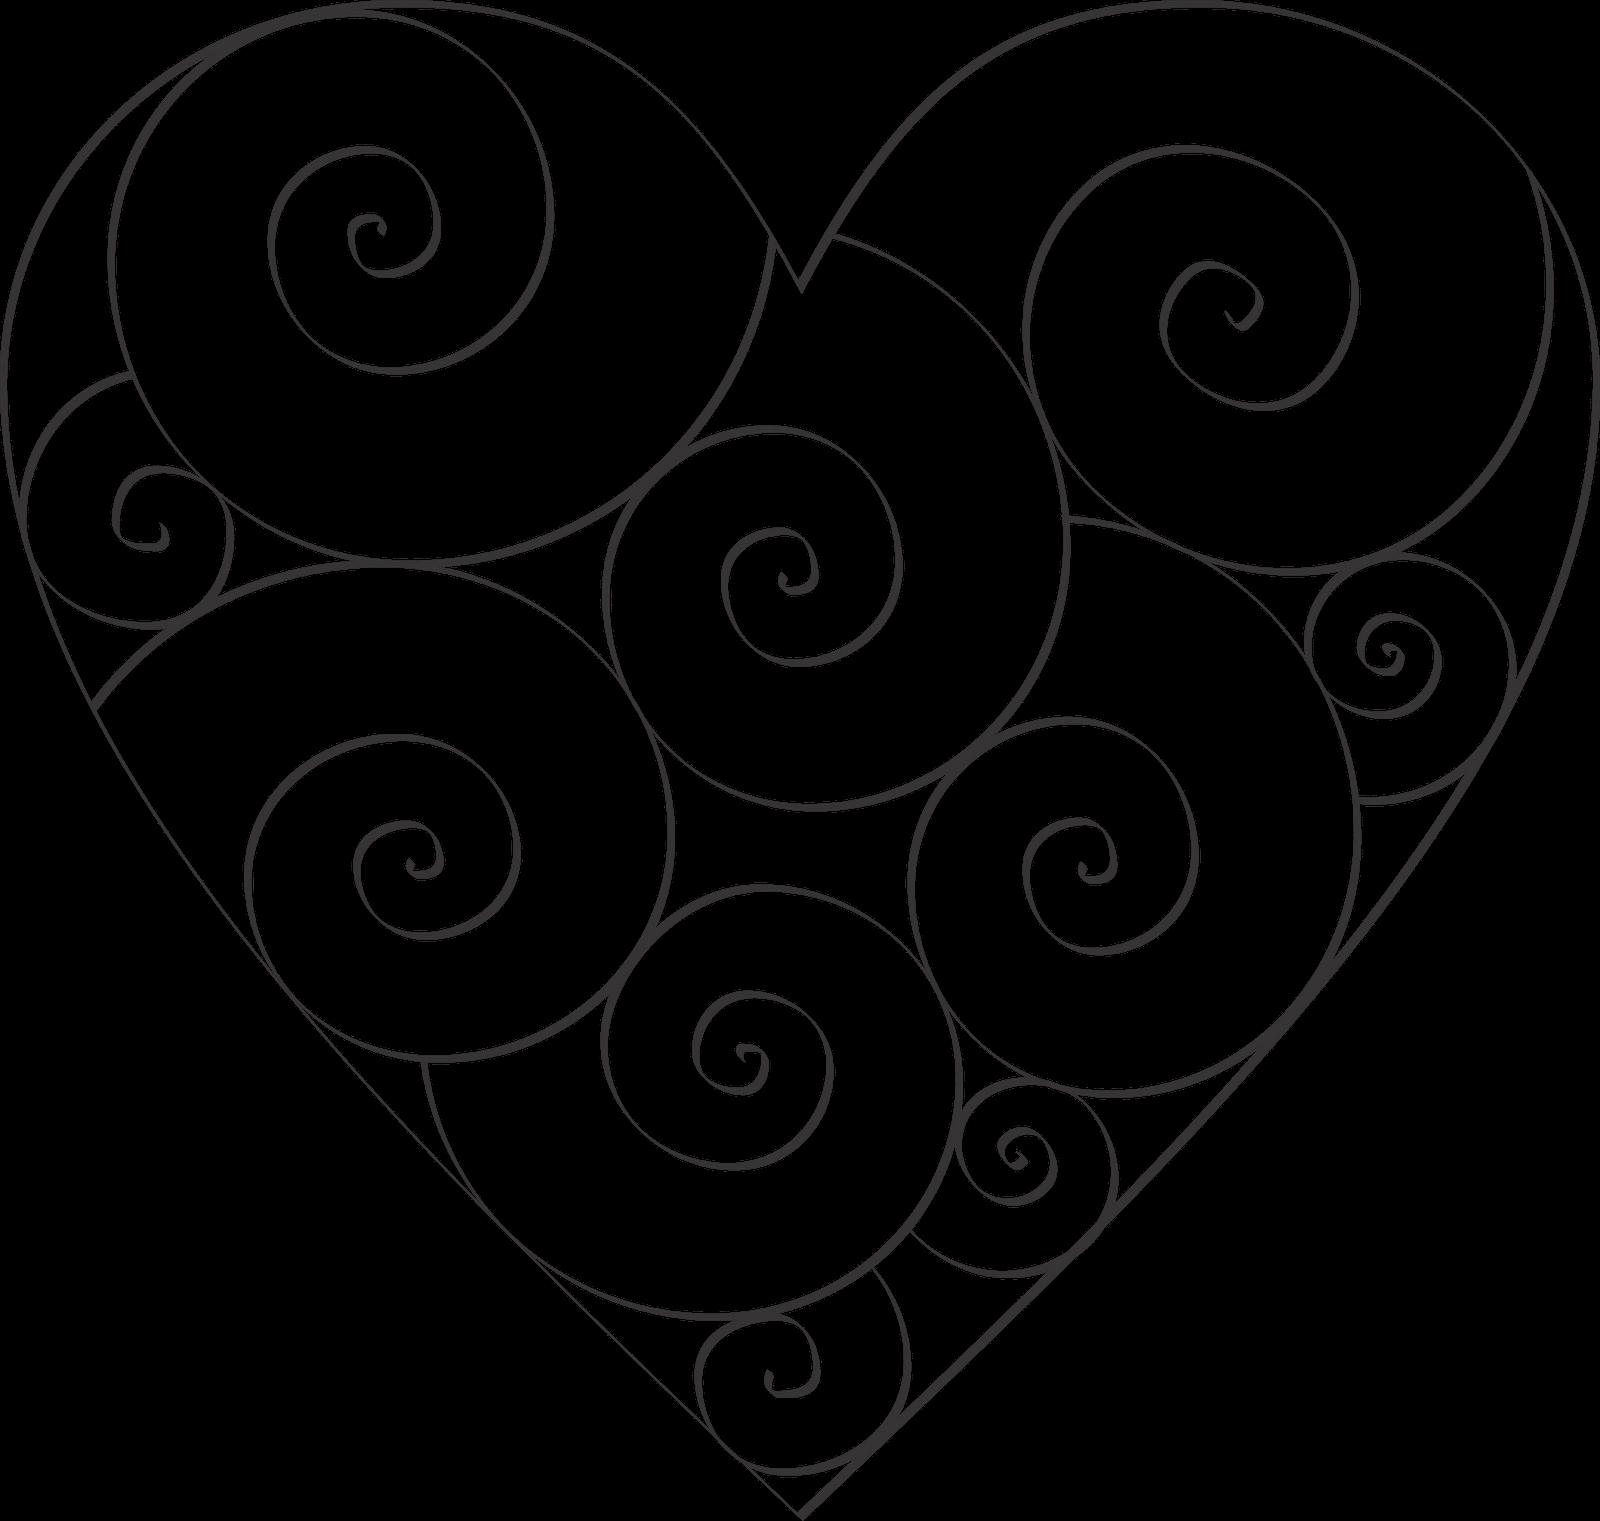 J Heart M